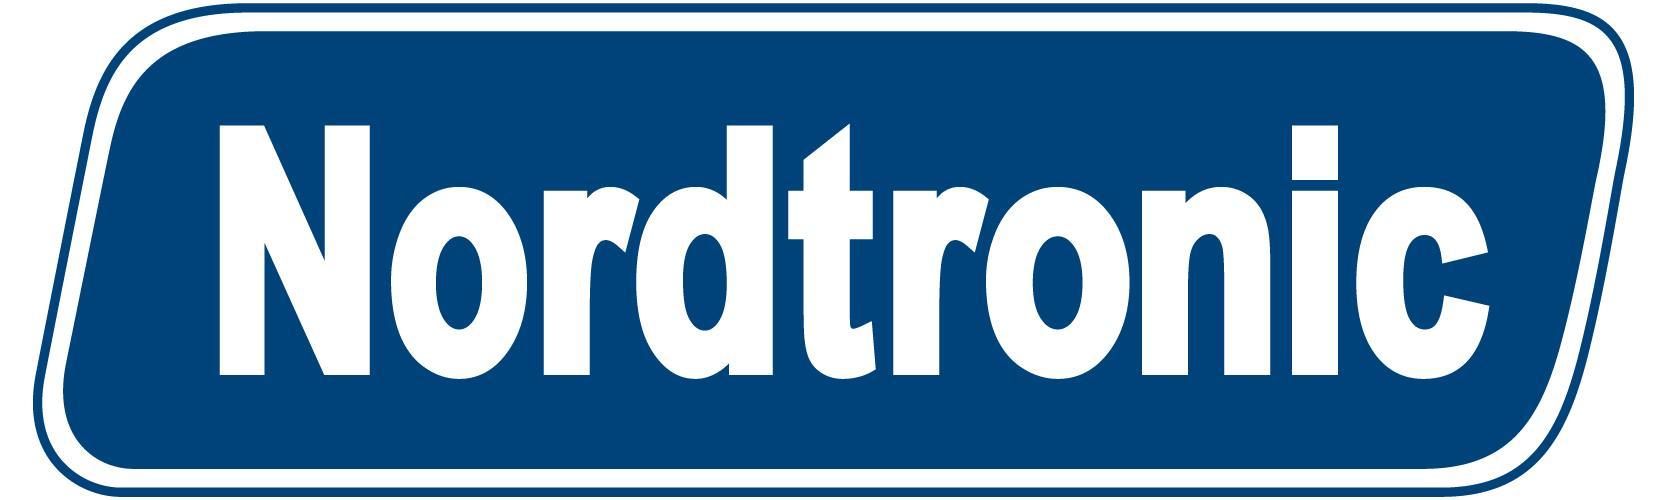 Nordtronic